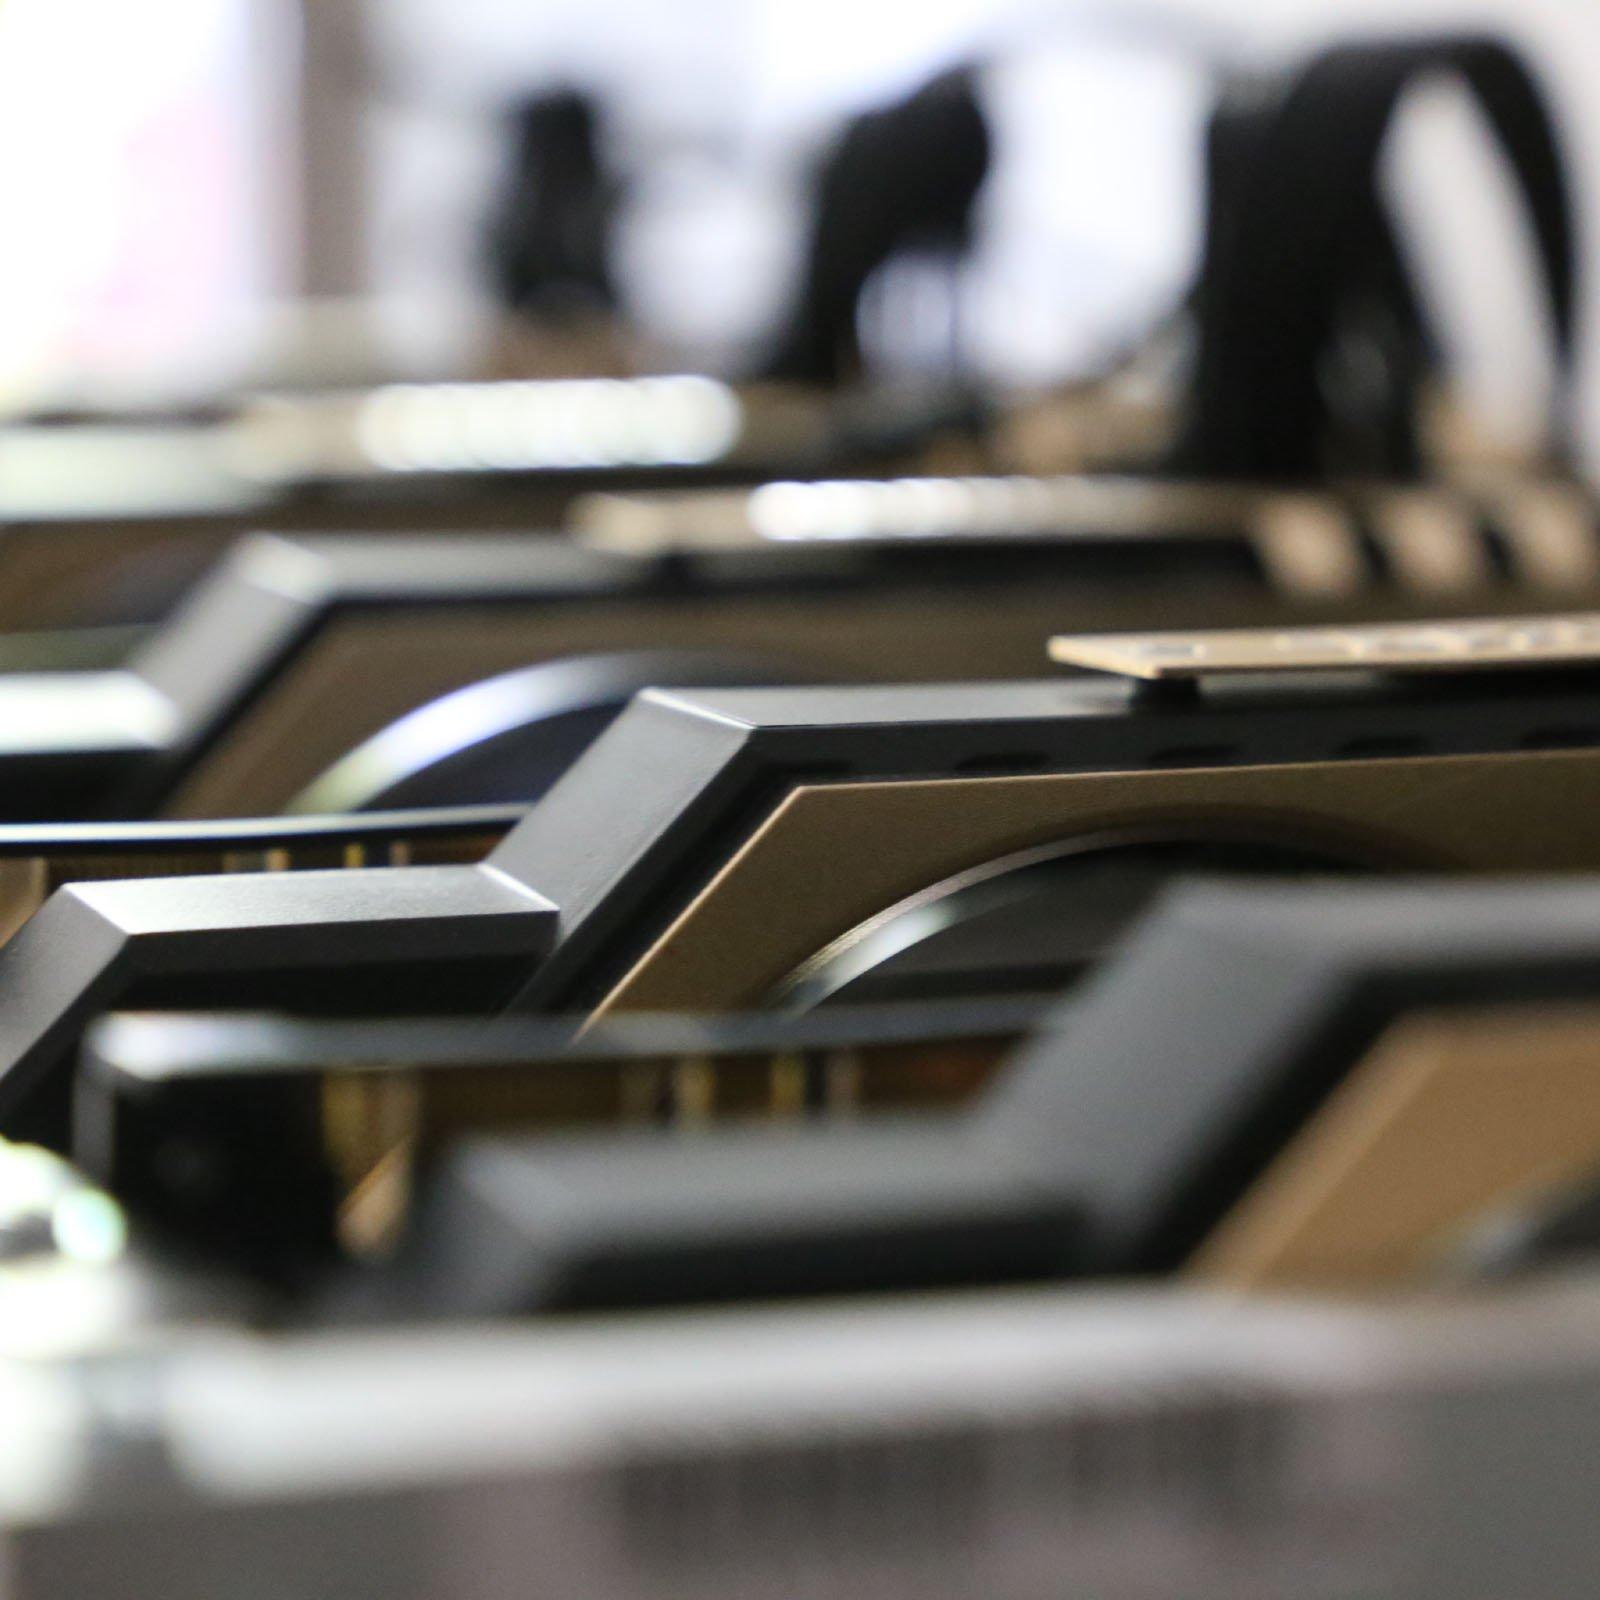 AMD Increases GPU Production to Match Mining Demand